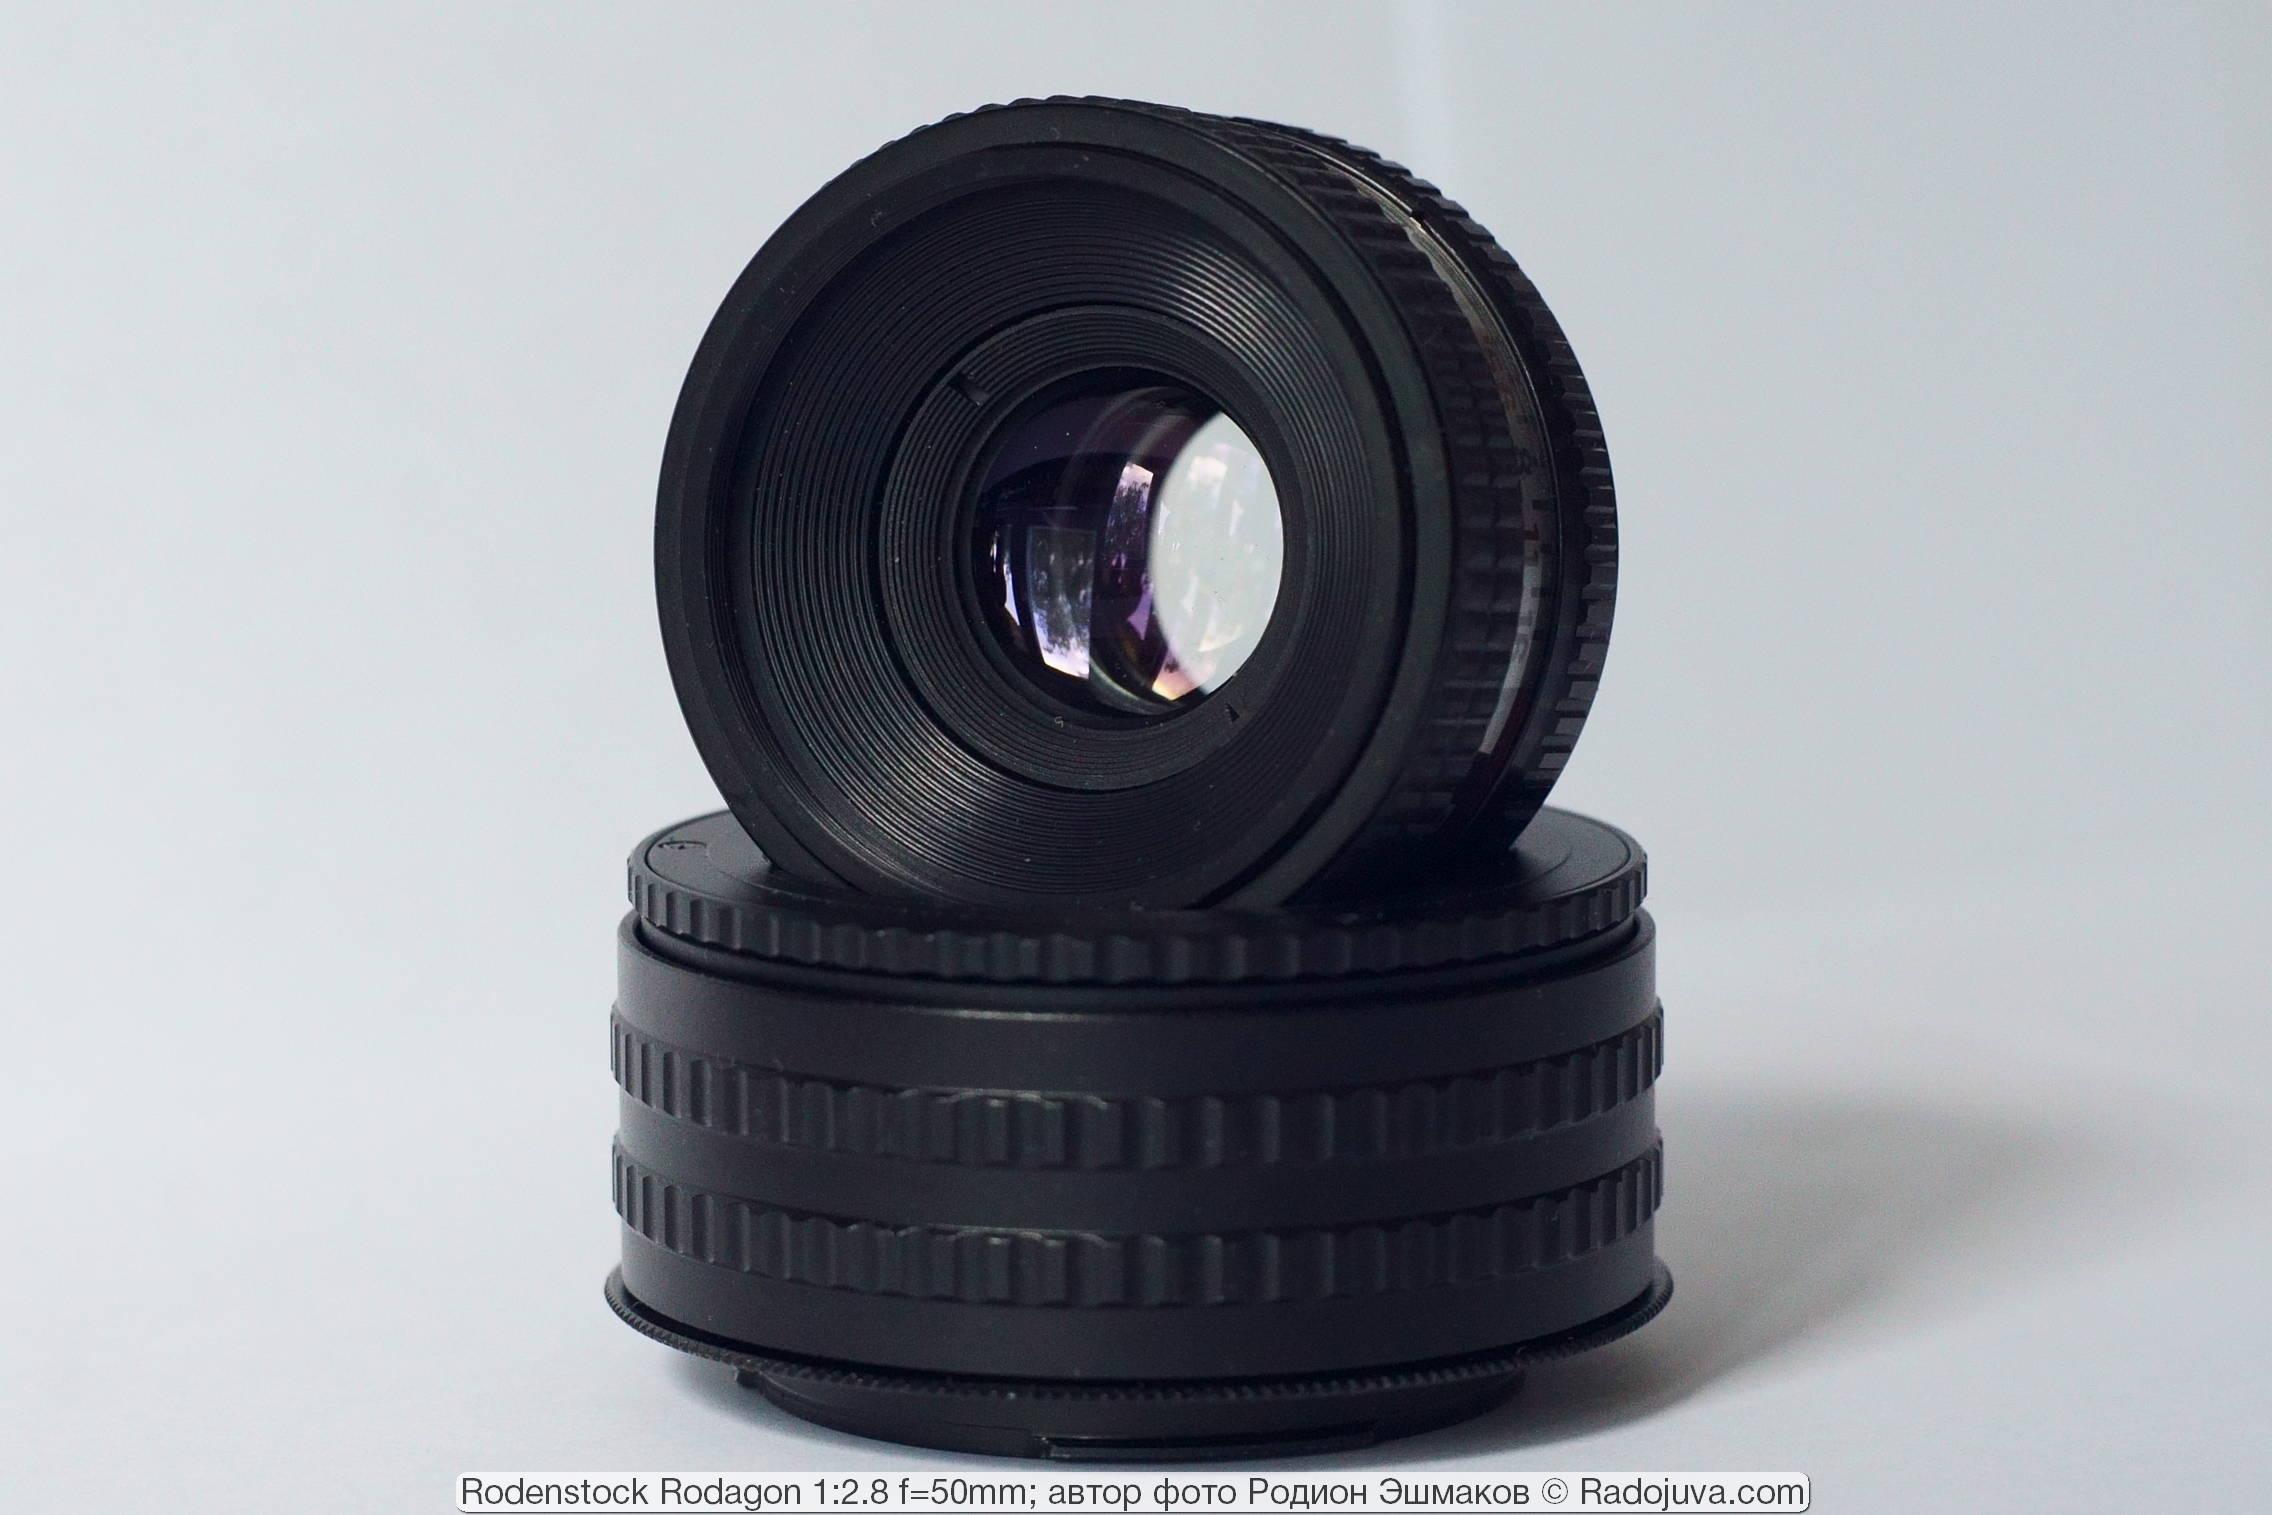 Rodenstock Rodagon 50/2.8 и макрогеликоид 25-55 мм.